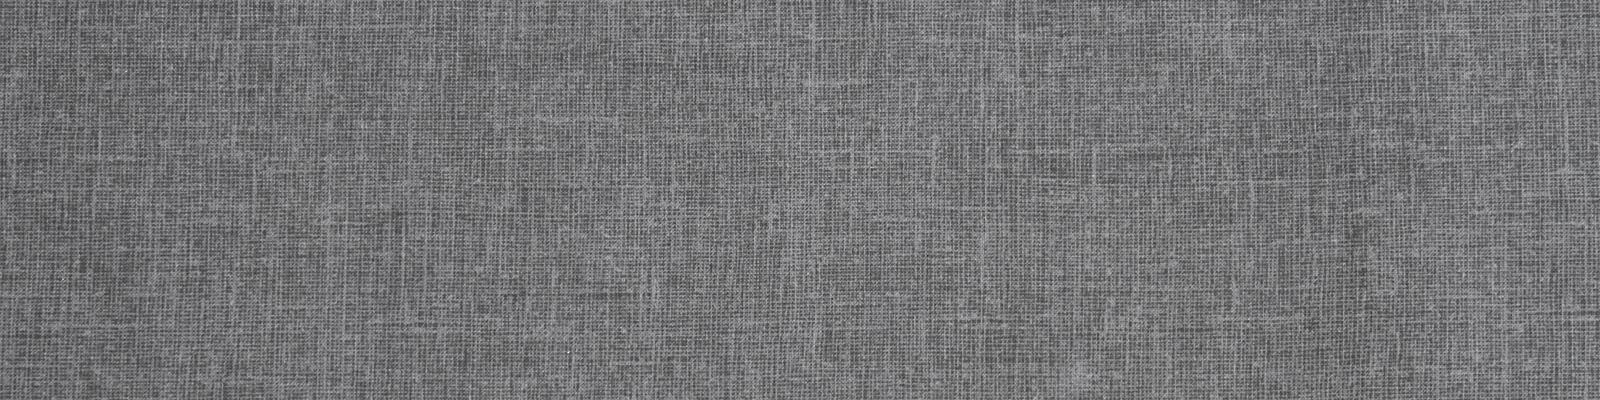 Amica Senior Lifestyles - Linen Background